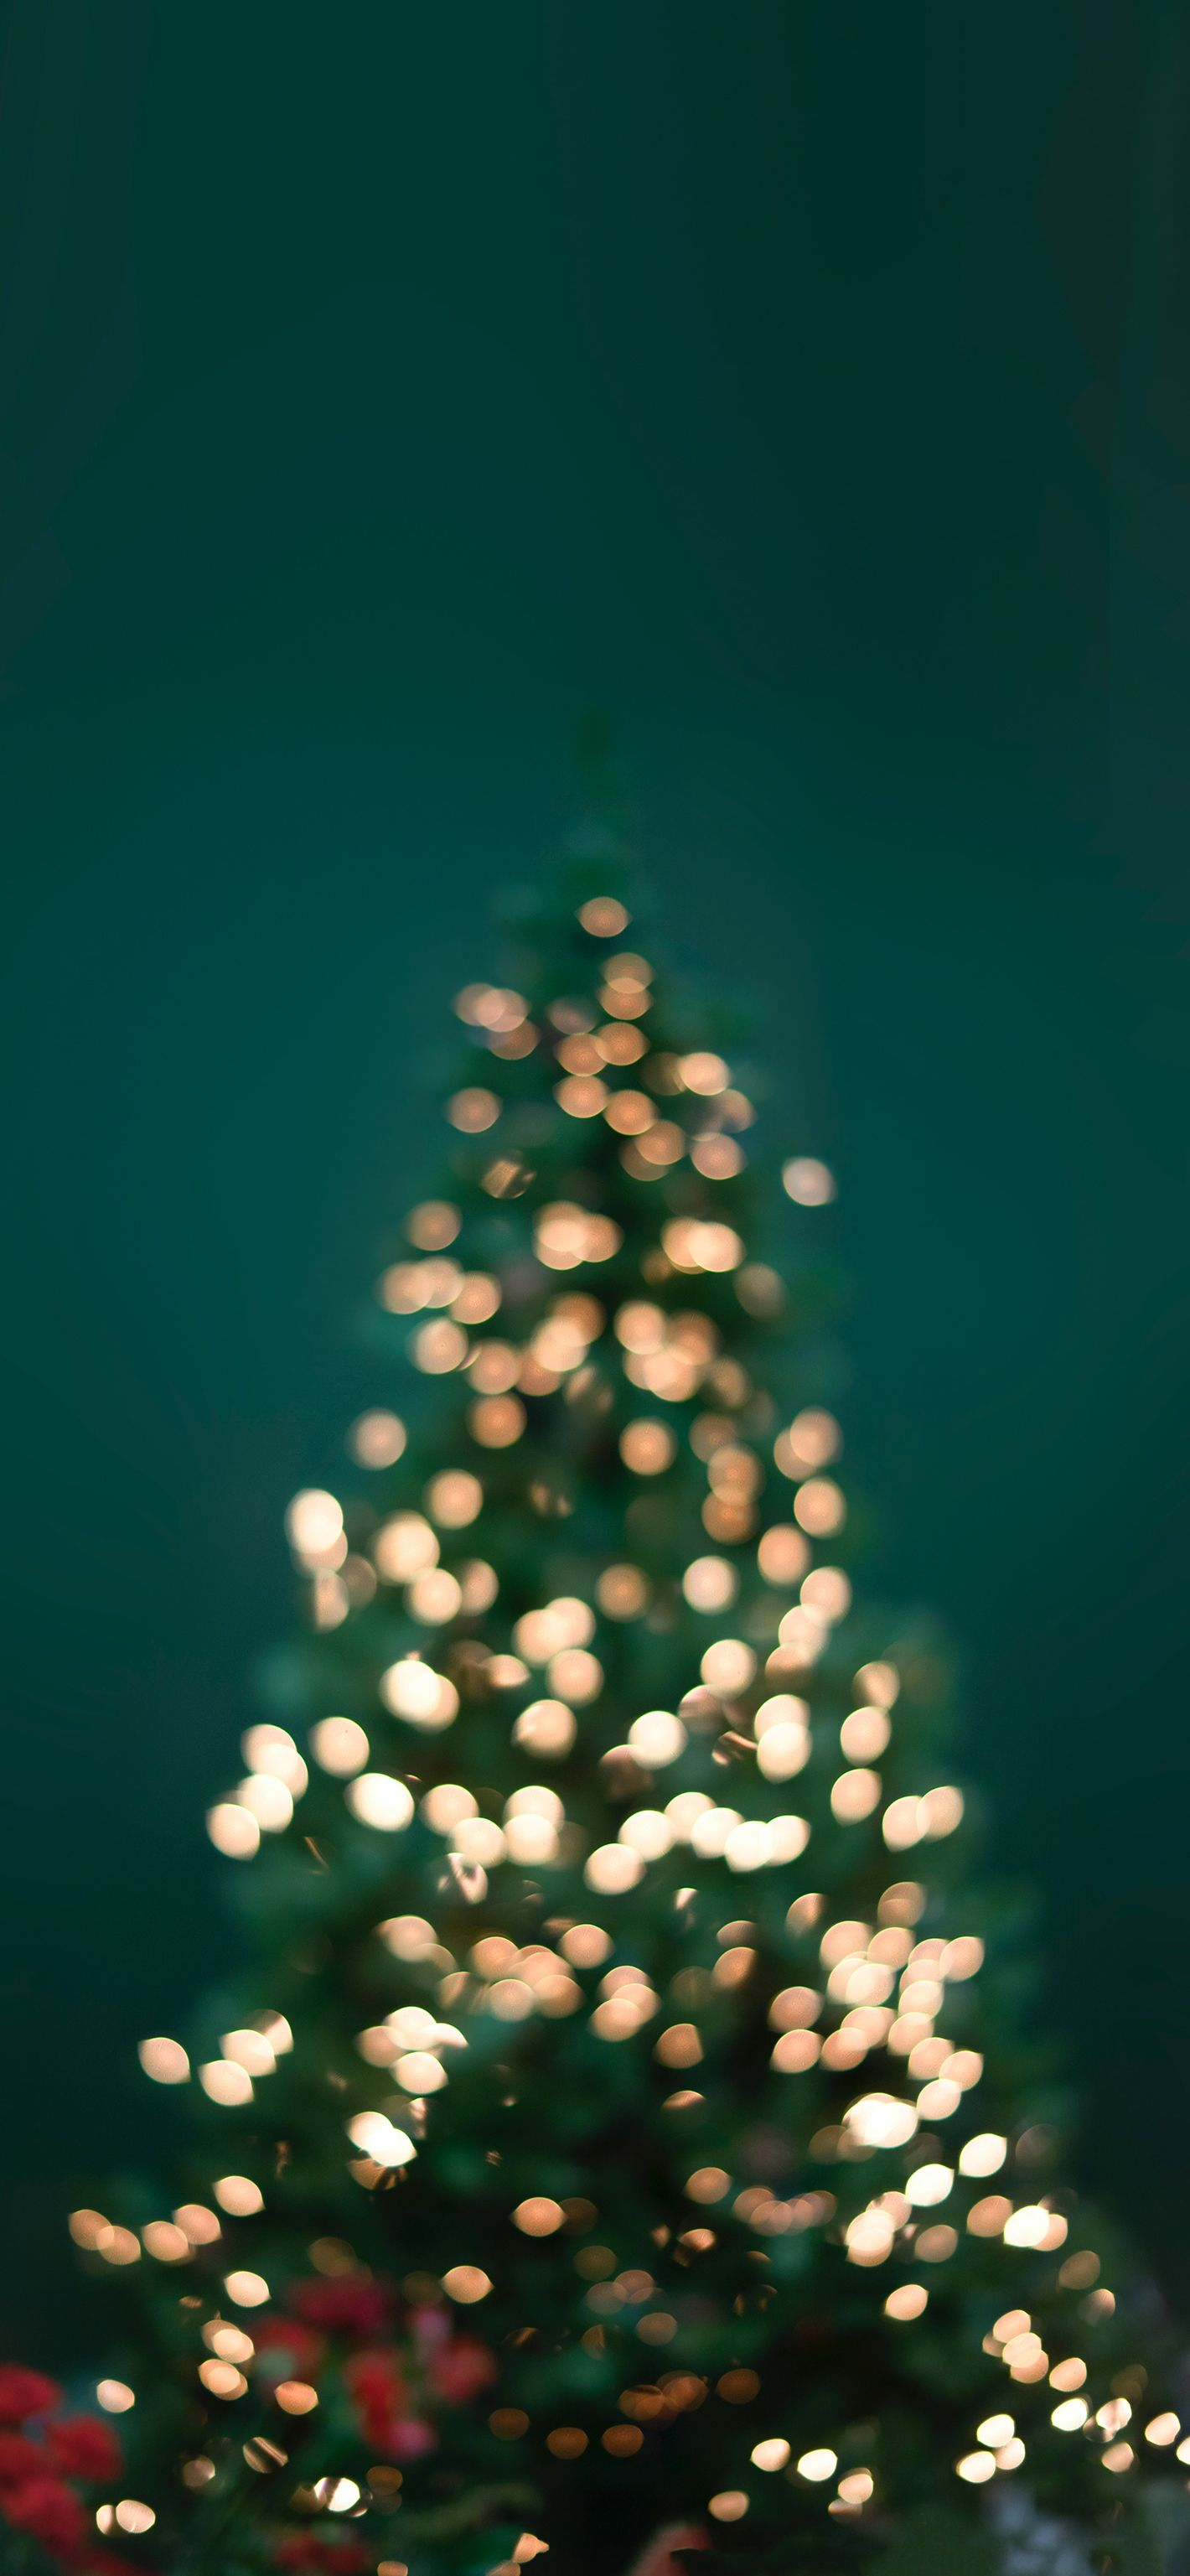 Christmas In Green Iphone Wallpaper Winter Winter Wallpaper Christmas Aesthetic Wallpaper